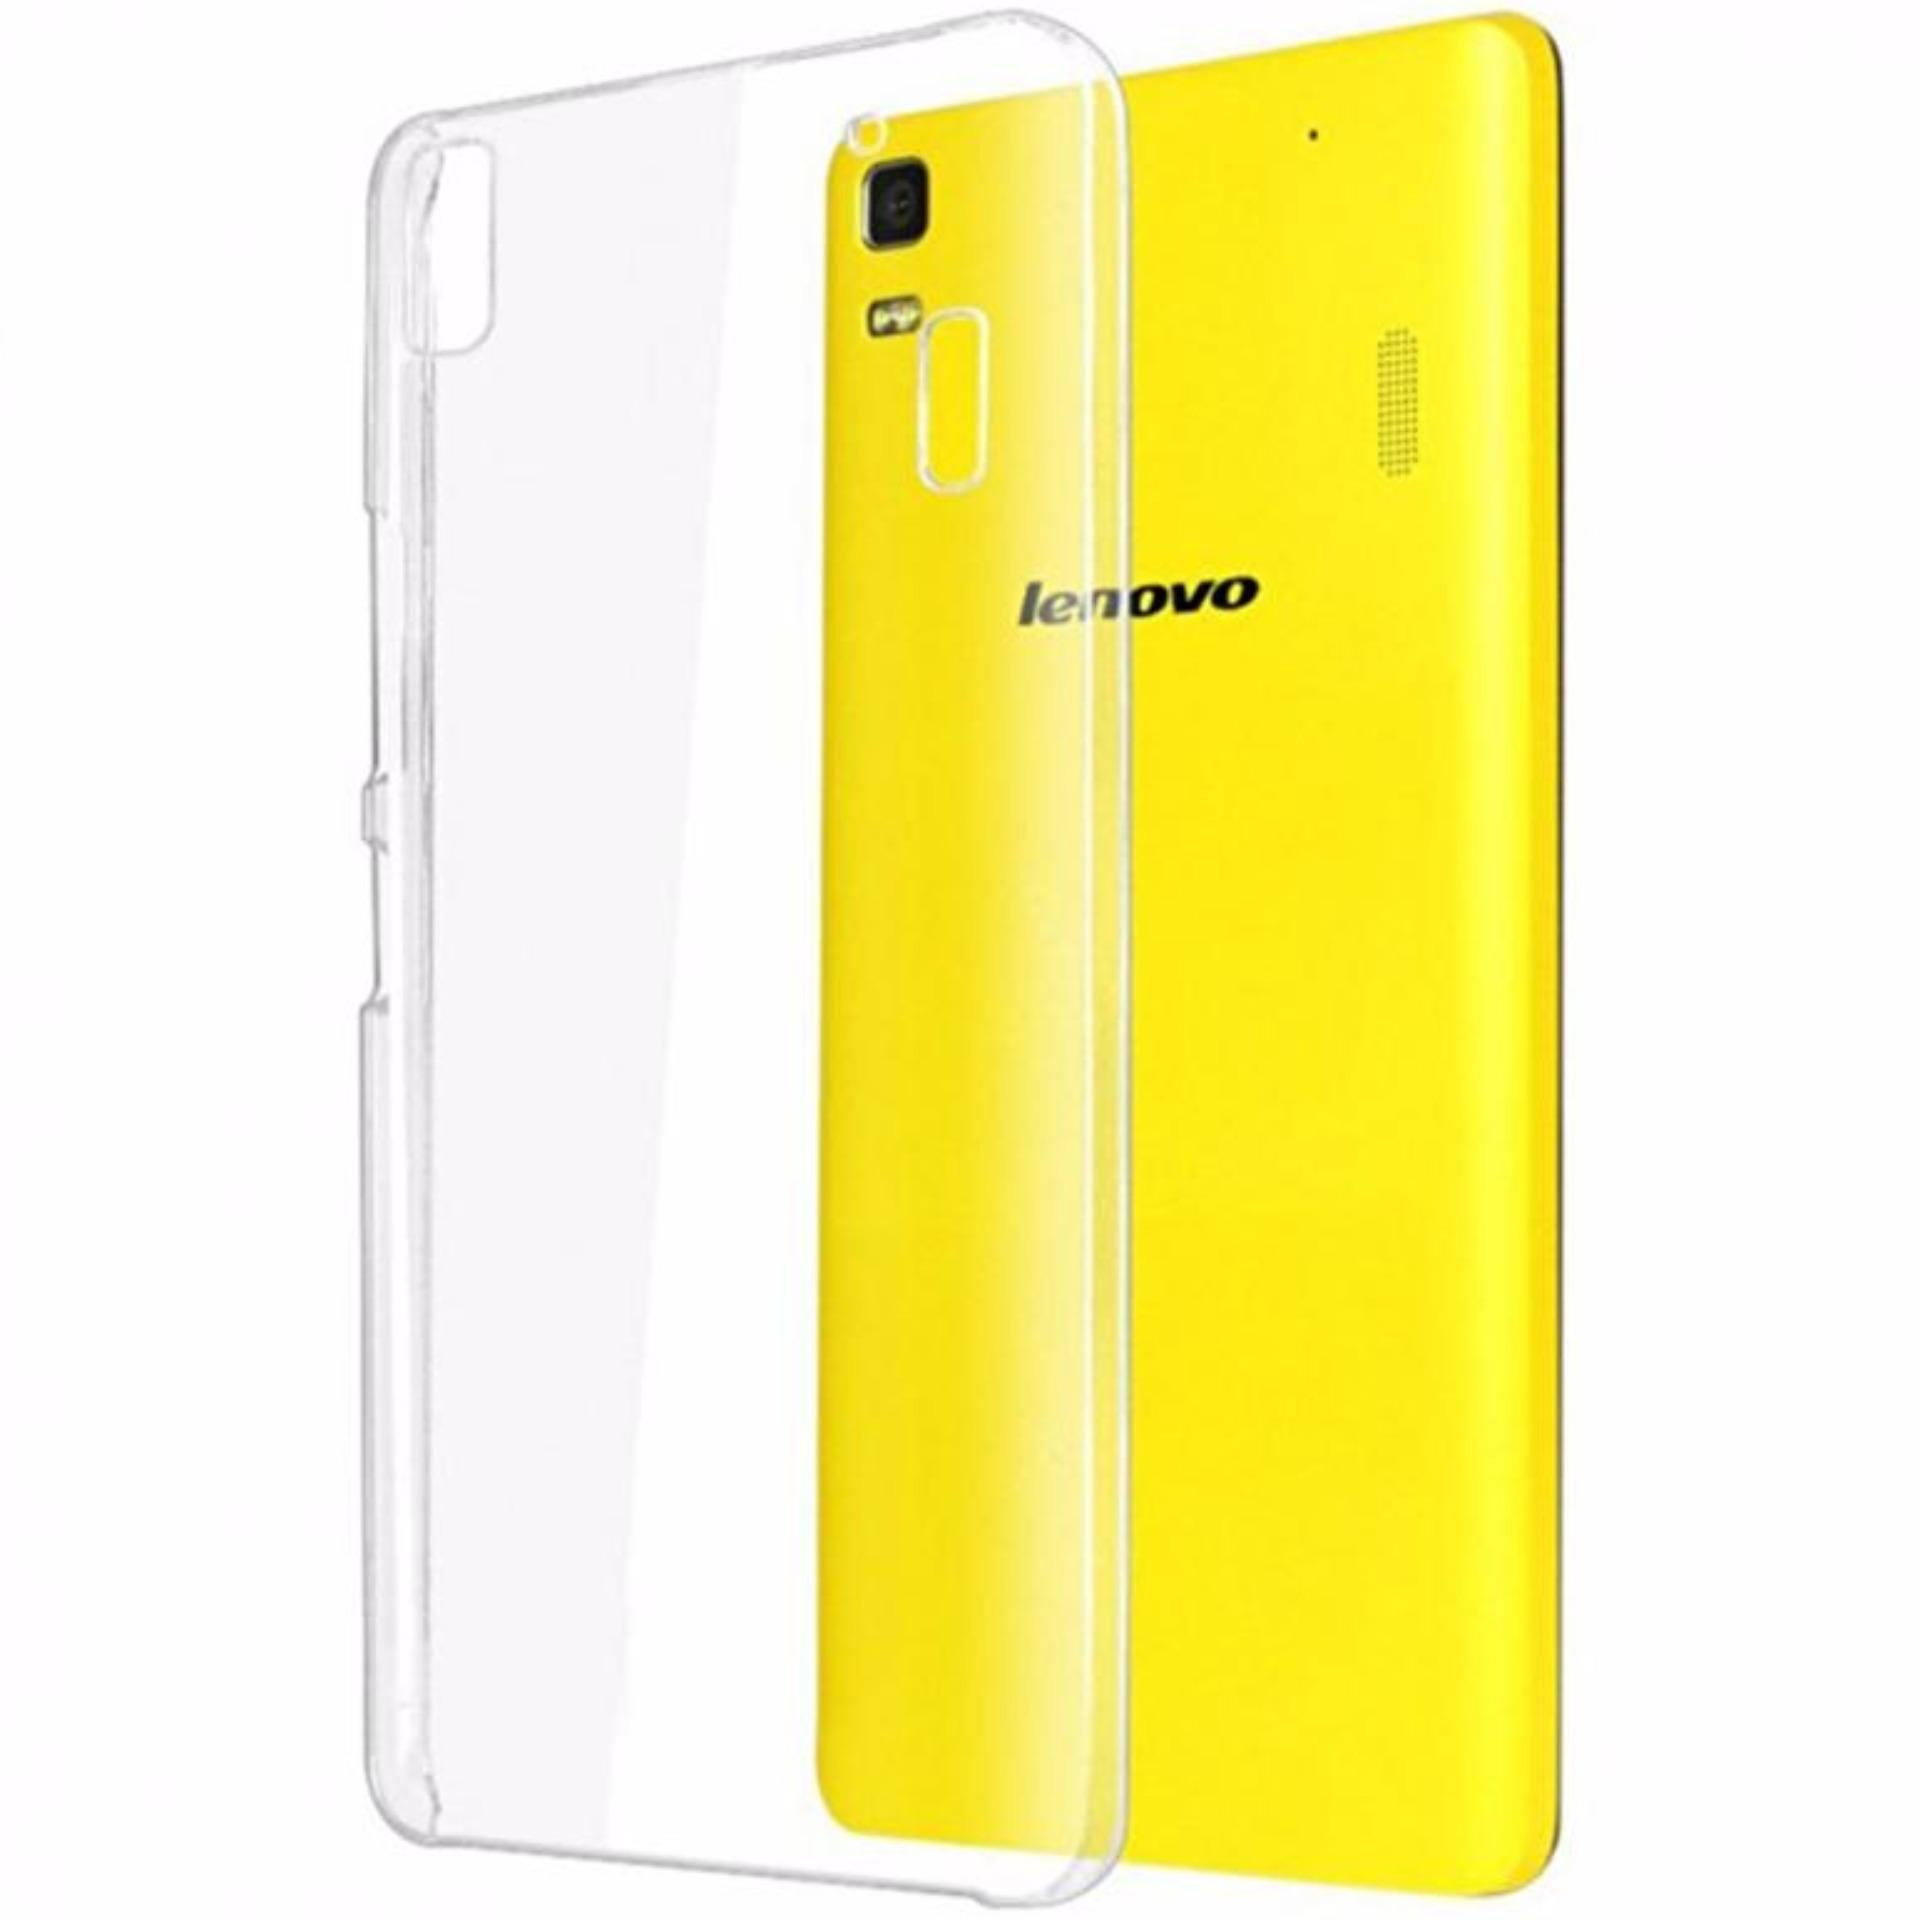 Bendoel Aircase for Lenovo A7000 / K3 Note / A7000+ Plus | Softcase Ultrathin Anti Crash - Putih Tr